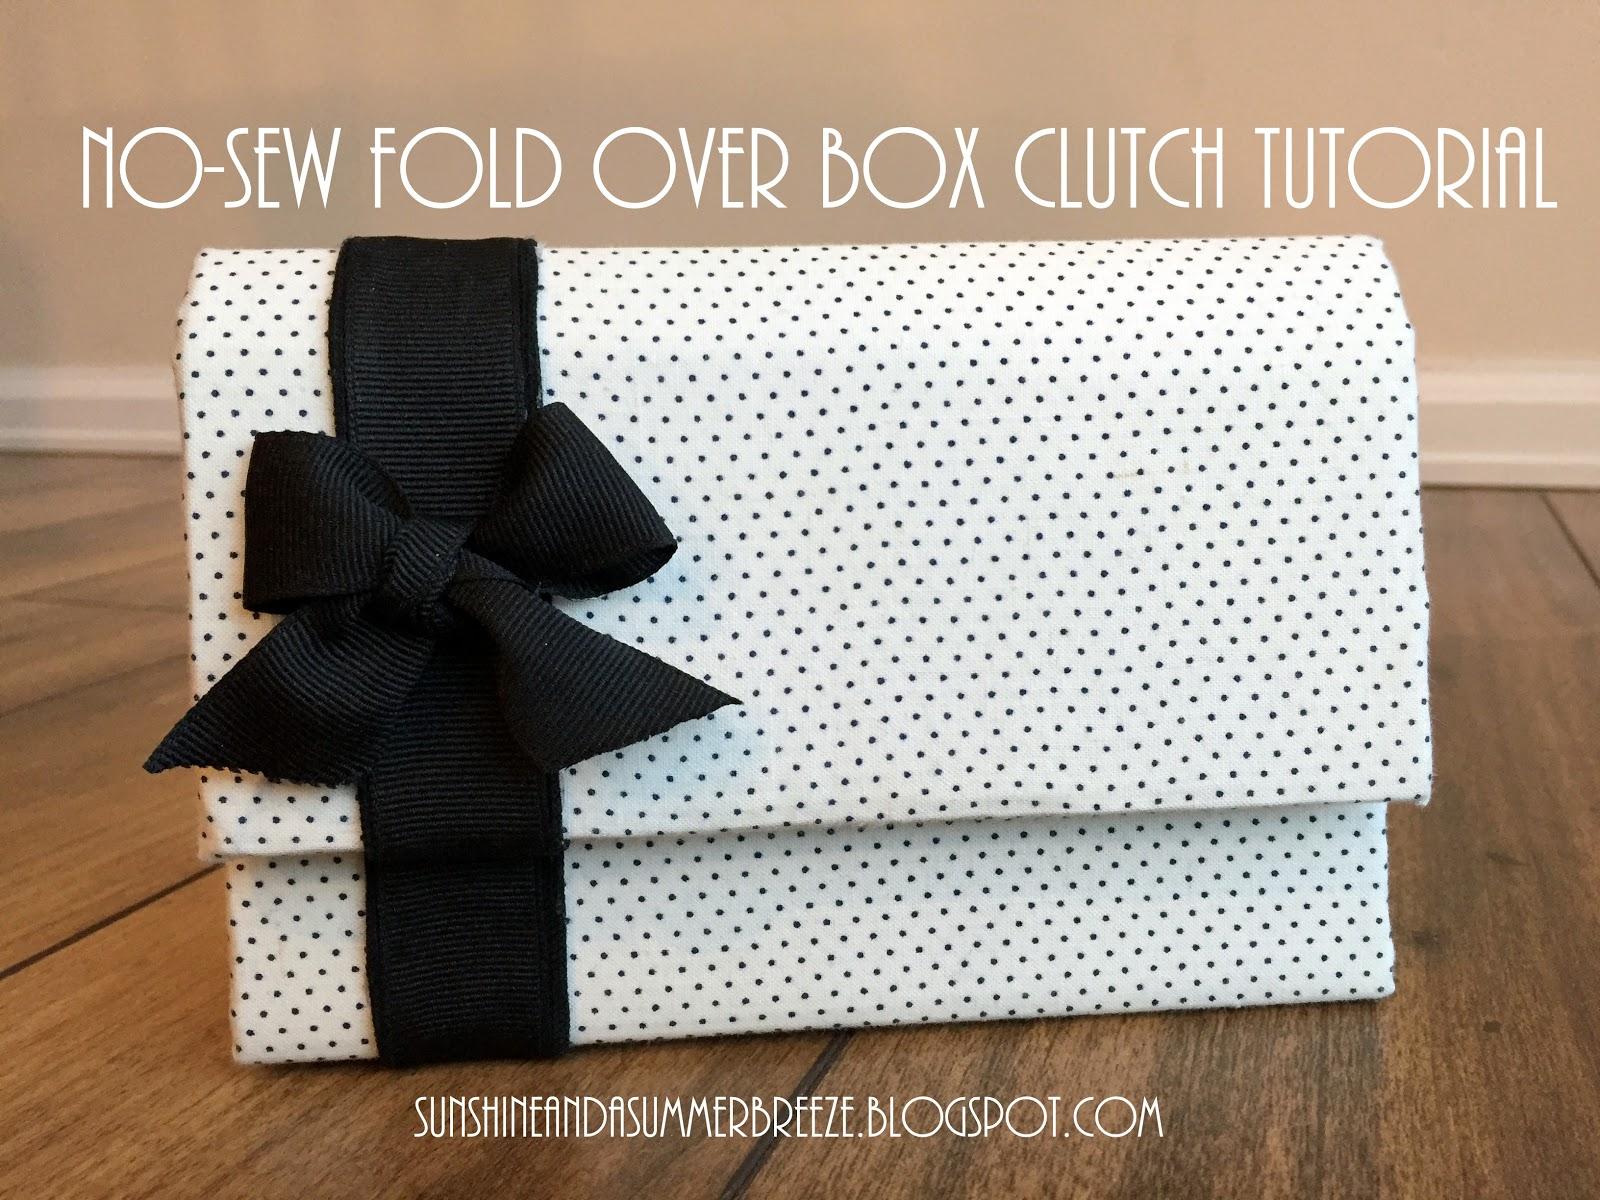 how to make hot glue gun with cardboard